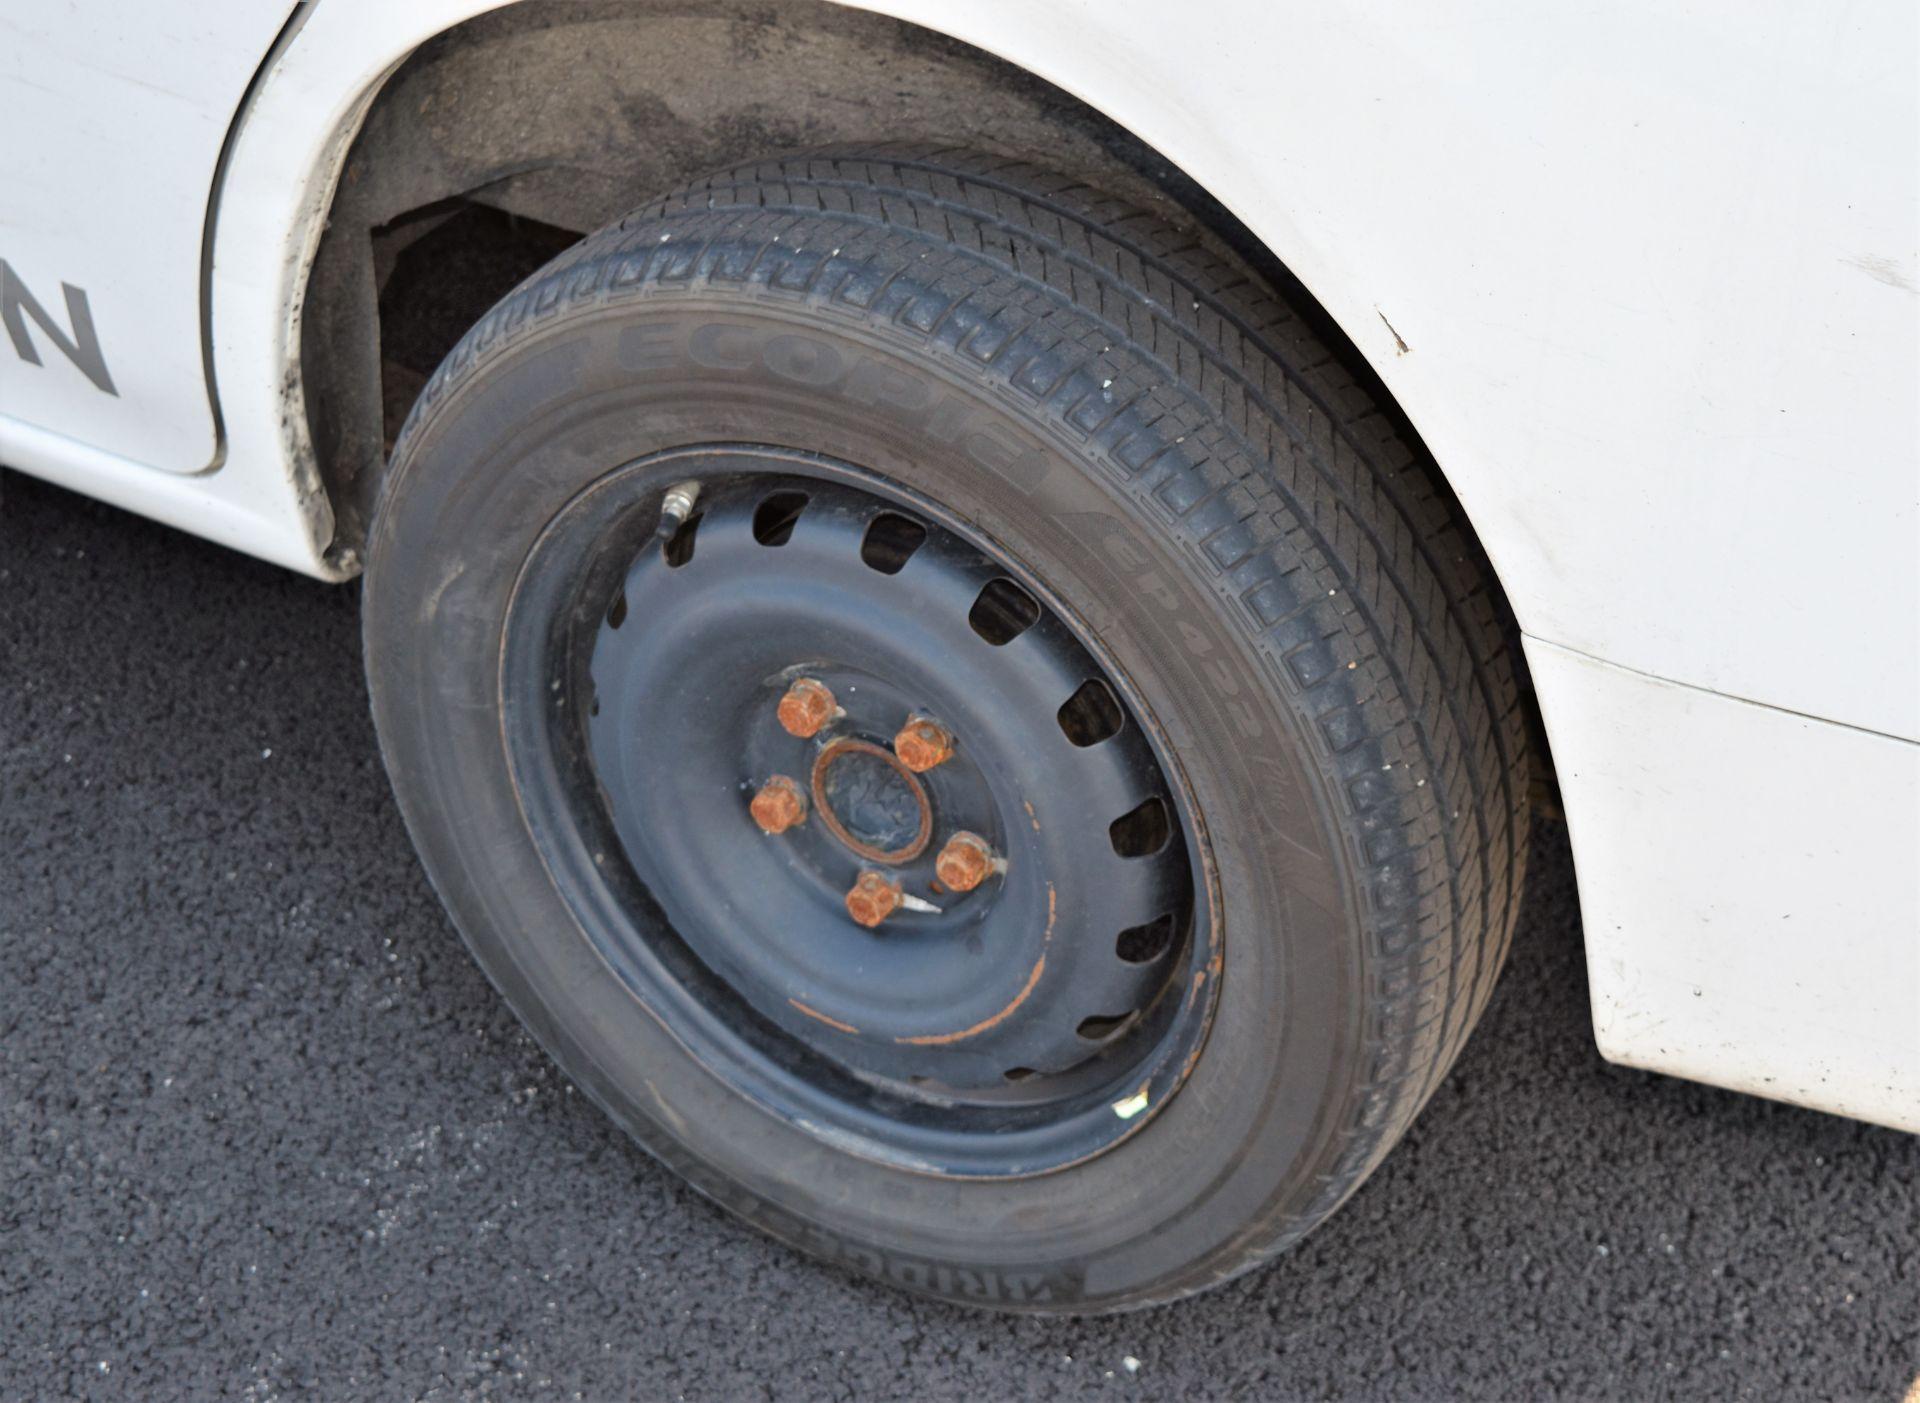 2013 Nissan NV200 Delivery Van - Image 34 of 54